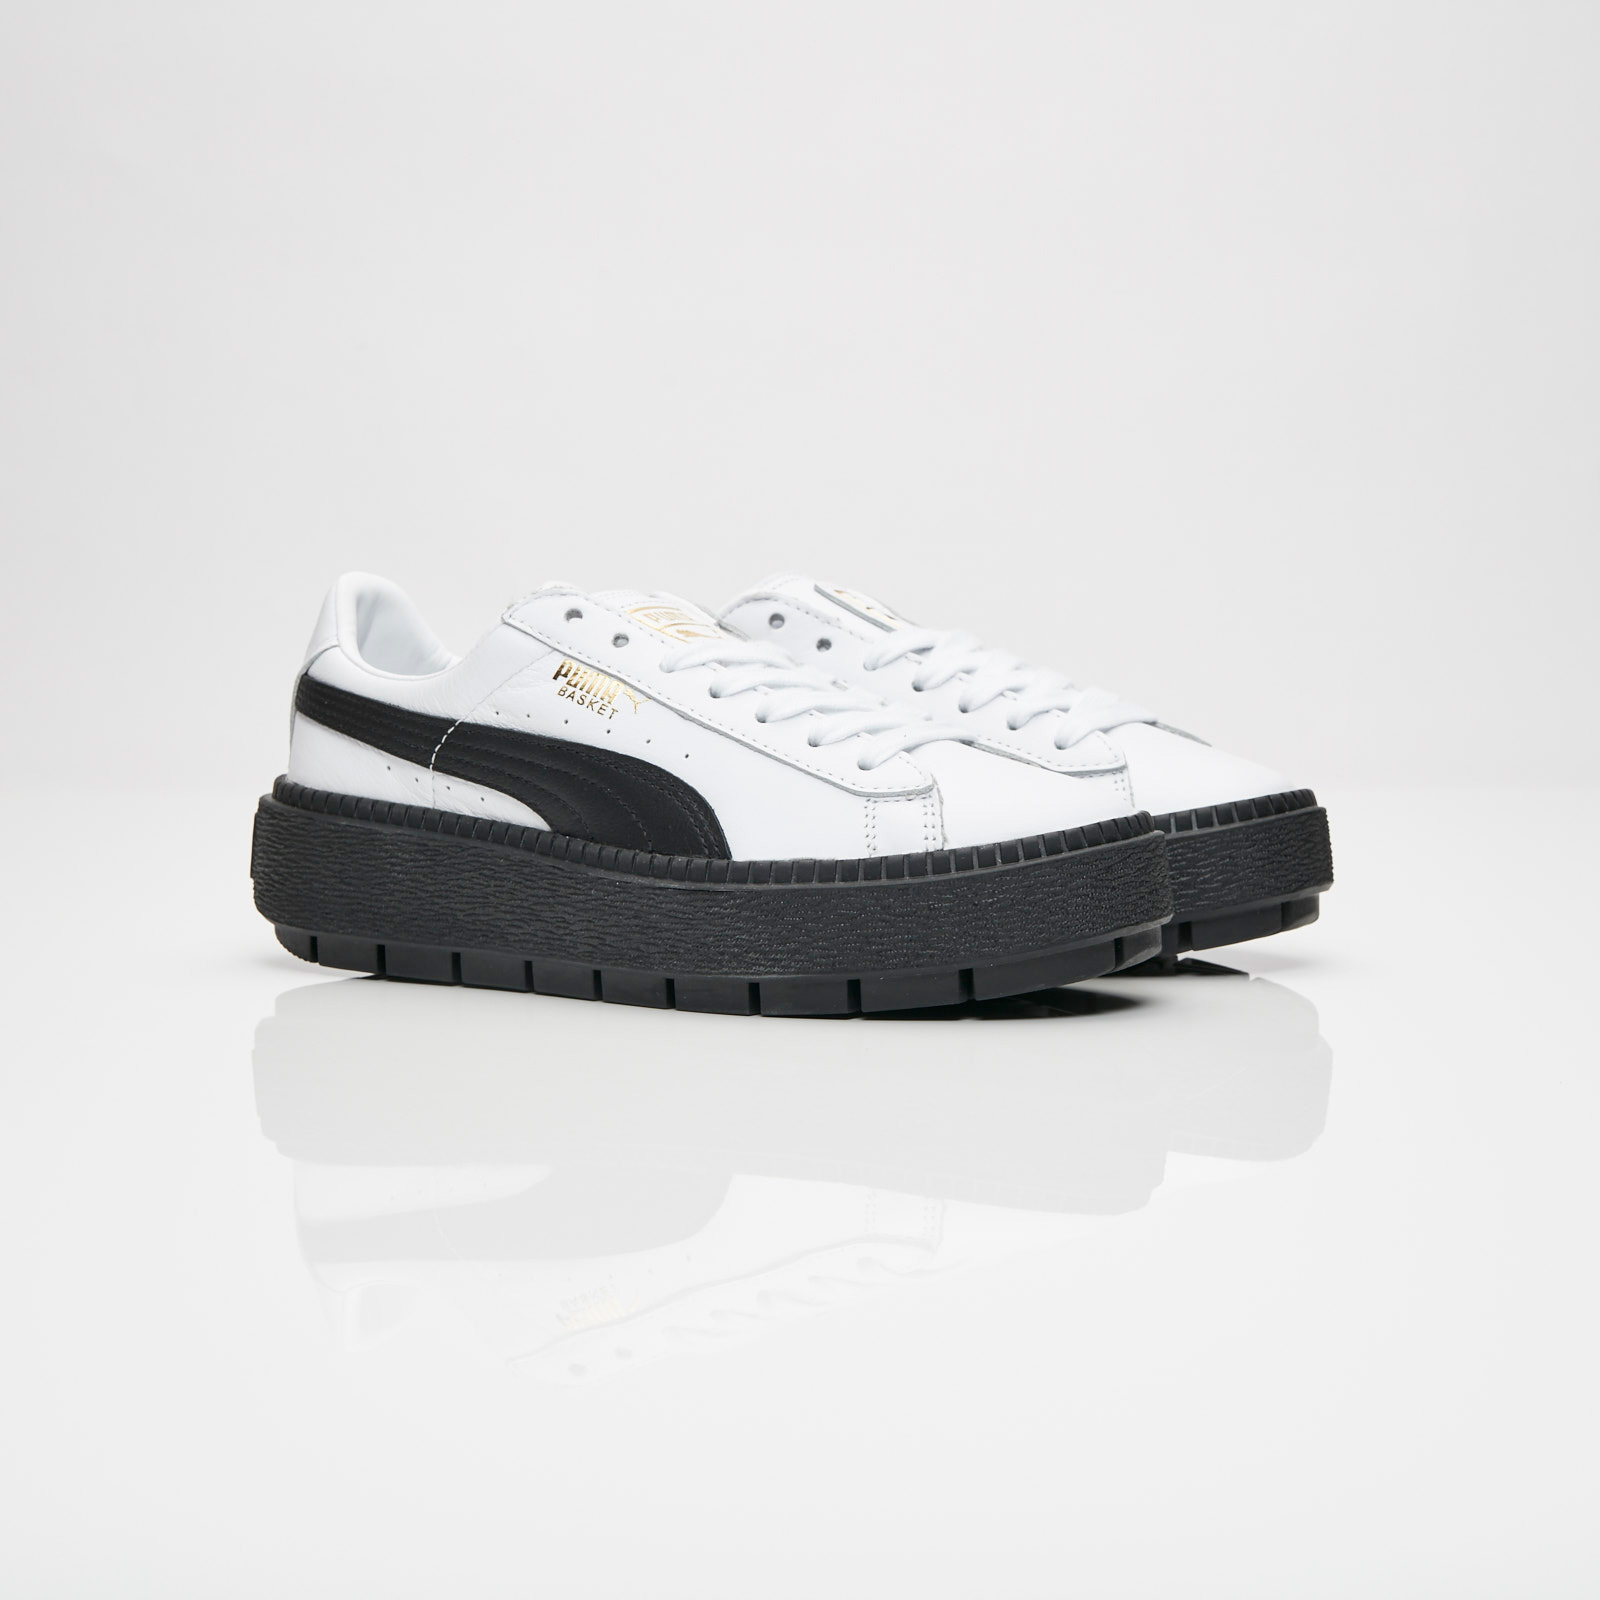 ea9ba20dee56 Puma Basket Platform Trace Wns - 366109-02 - Sneakersnstuff ...